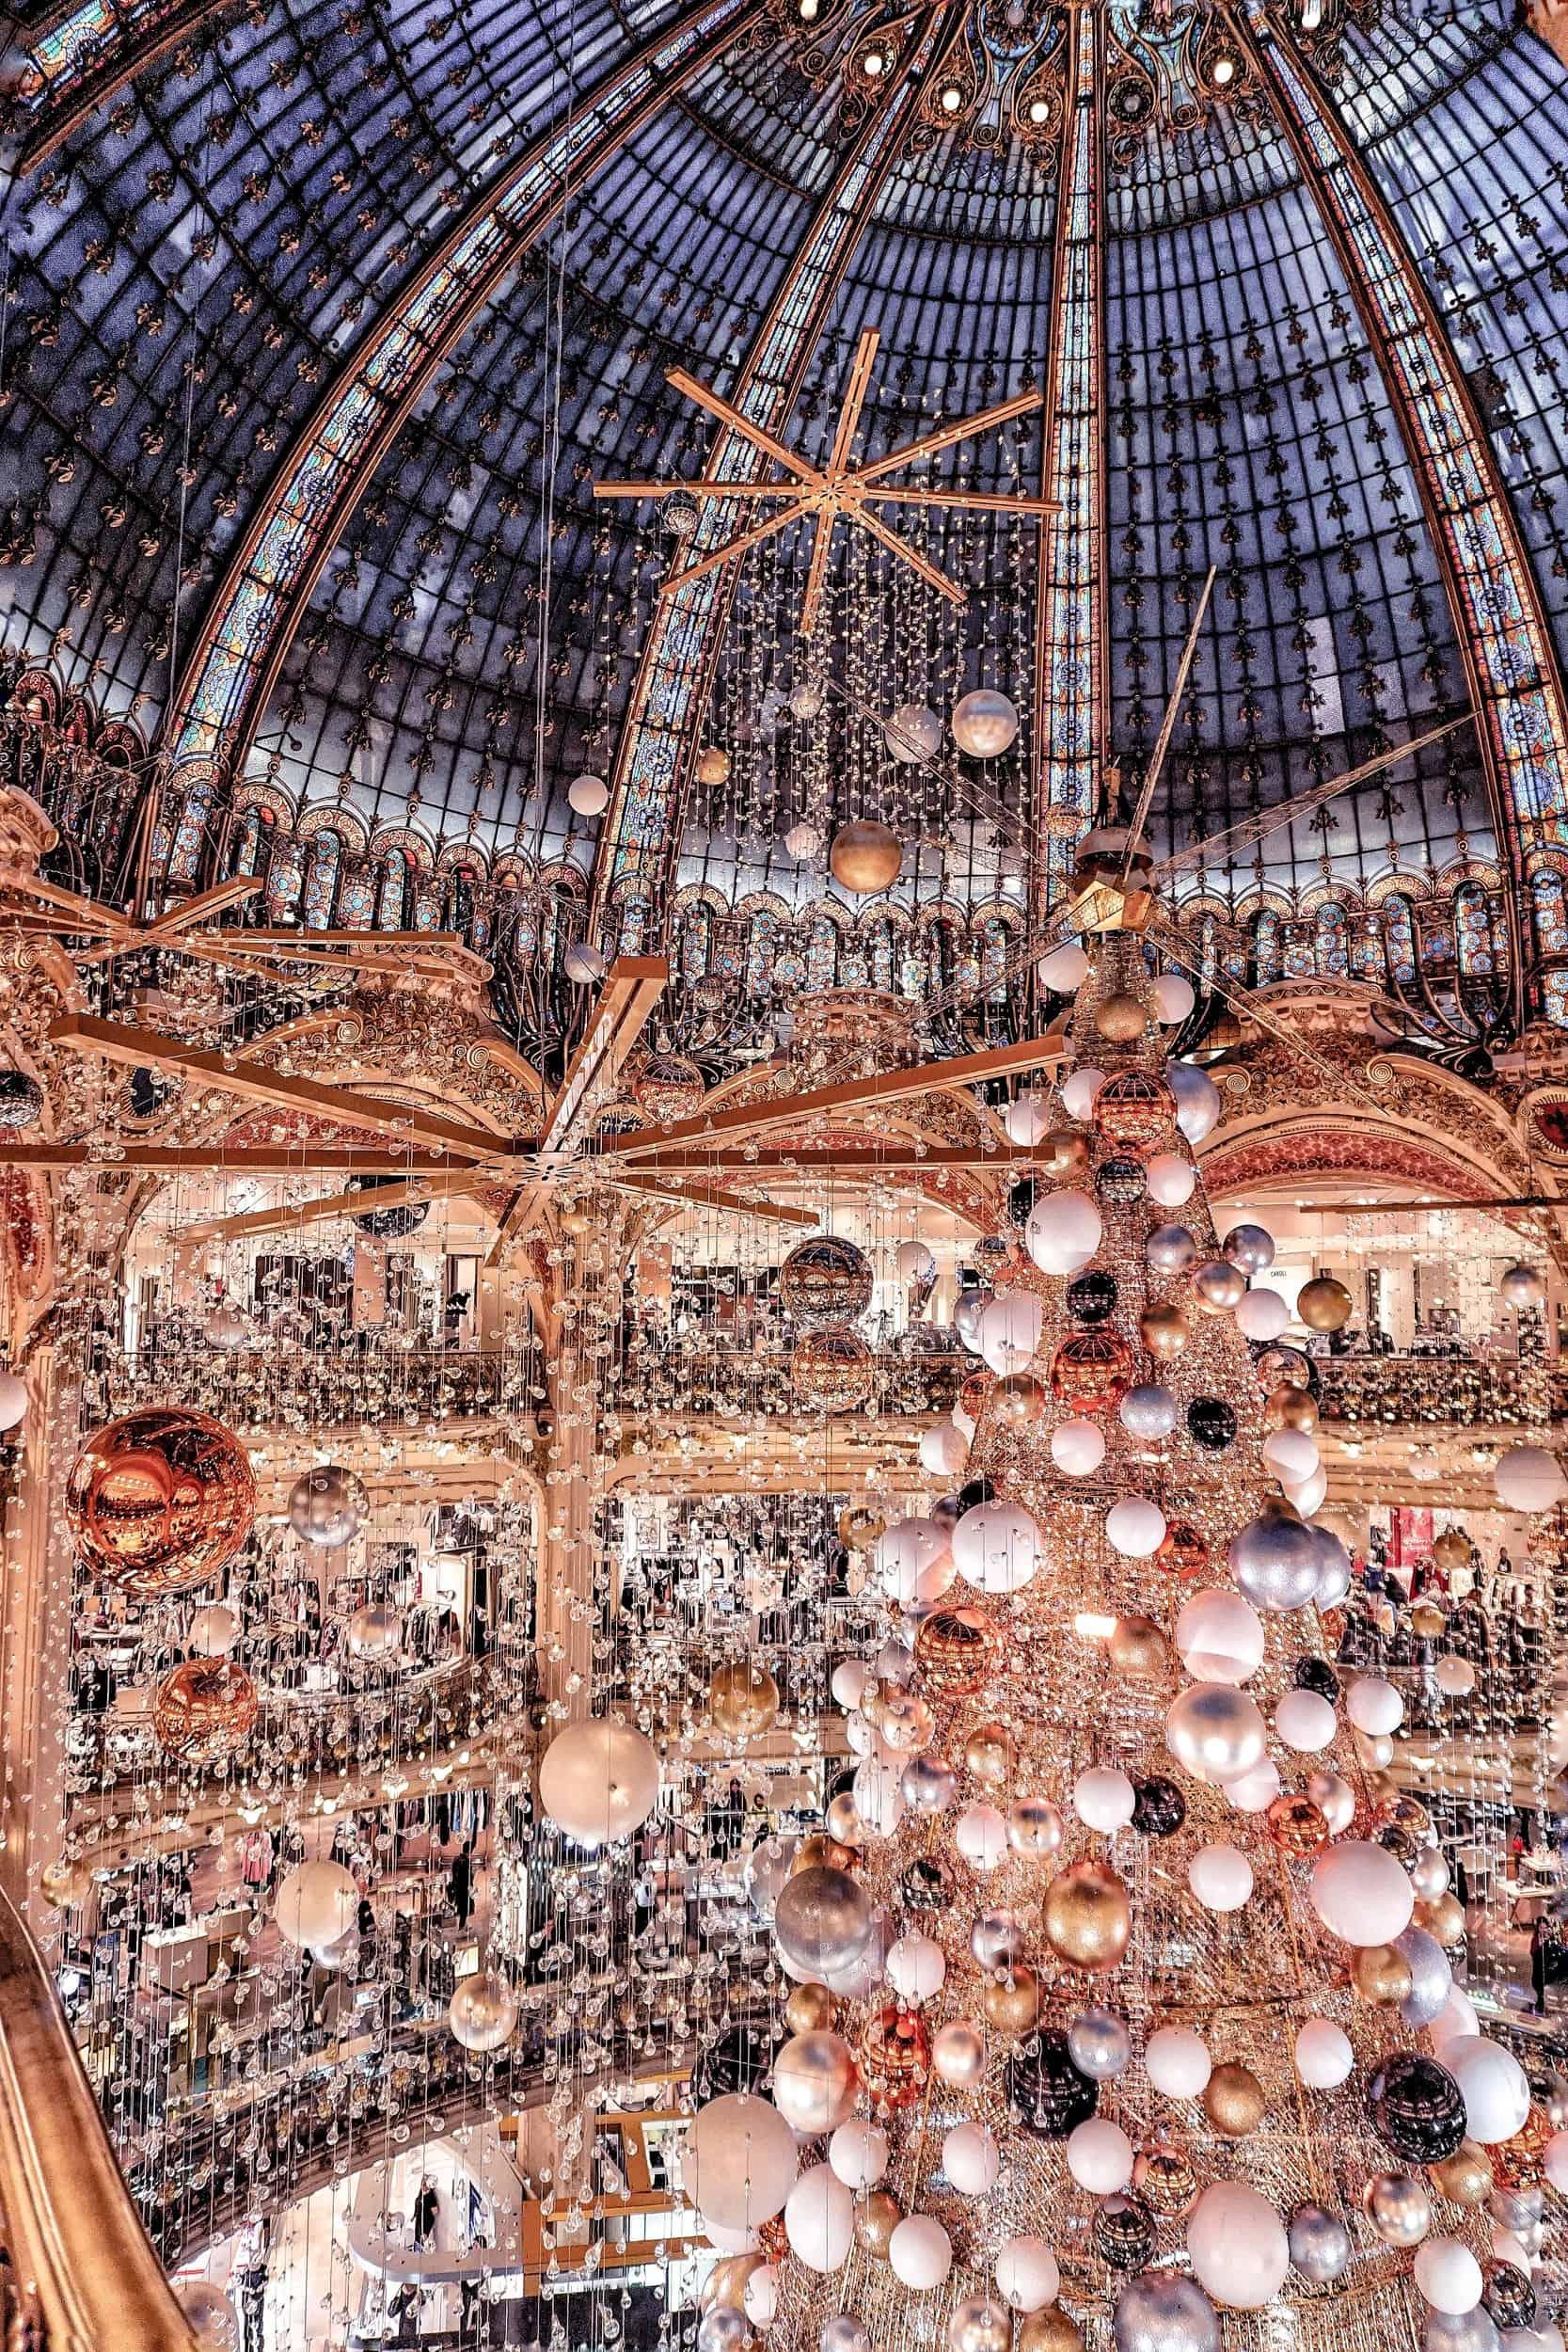 Galeries Lafayette Christmas tree: feeling festive in Paris, France 2015